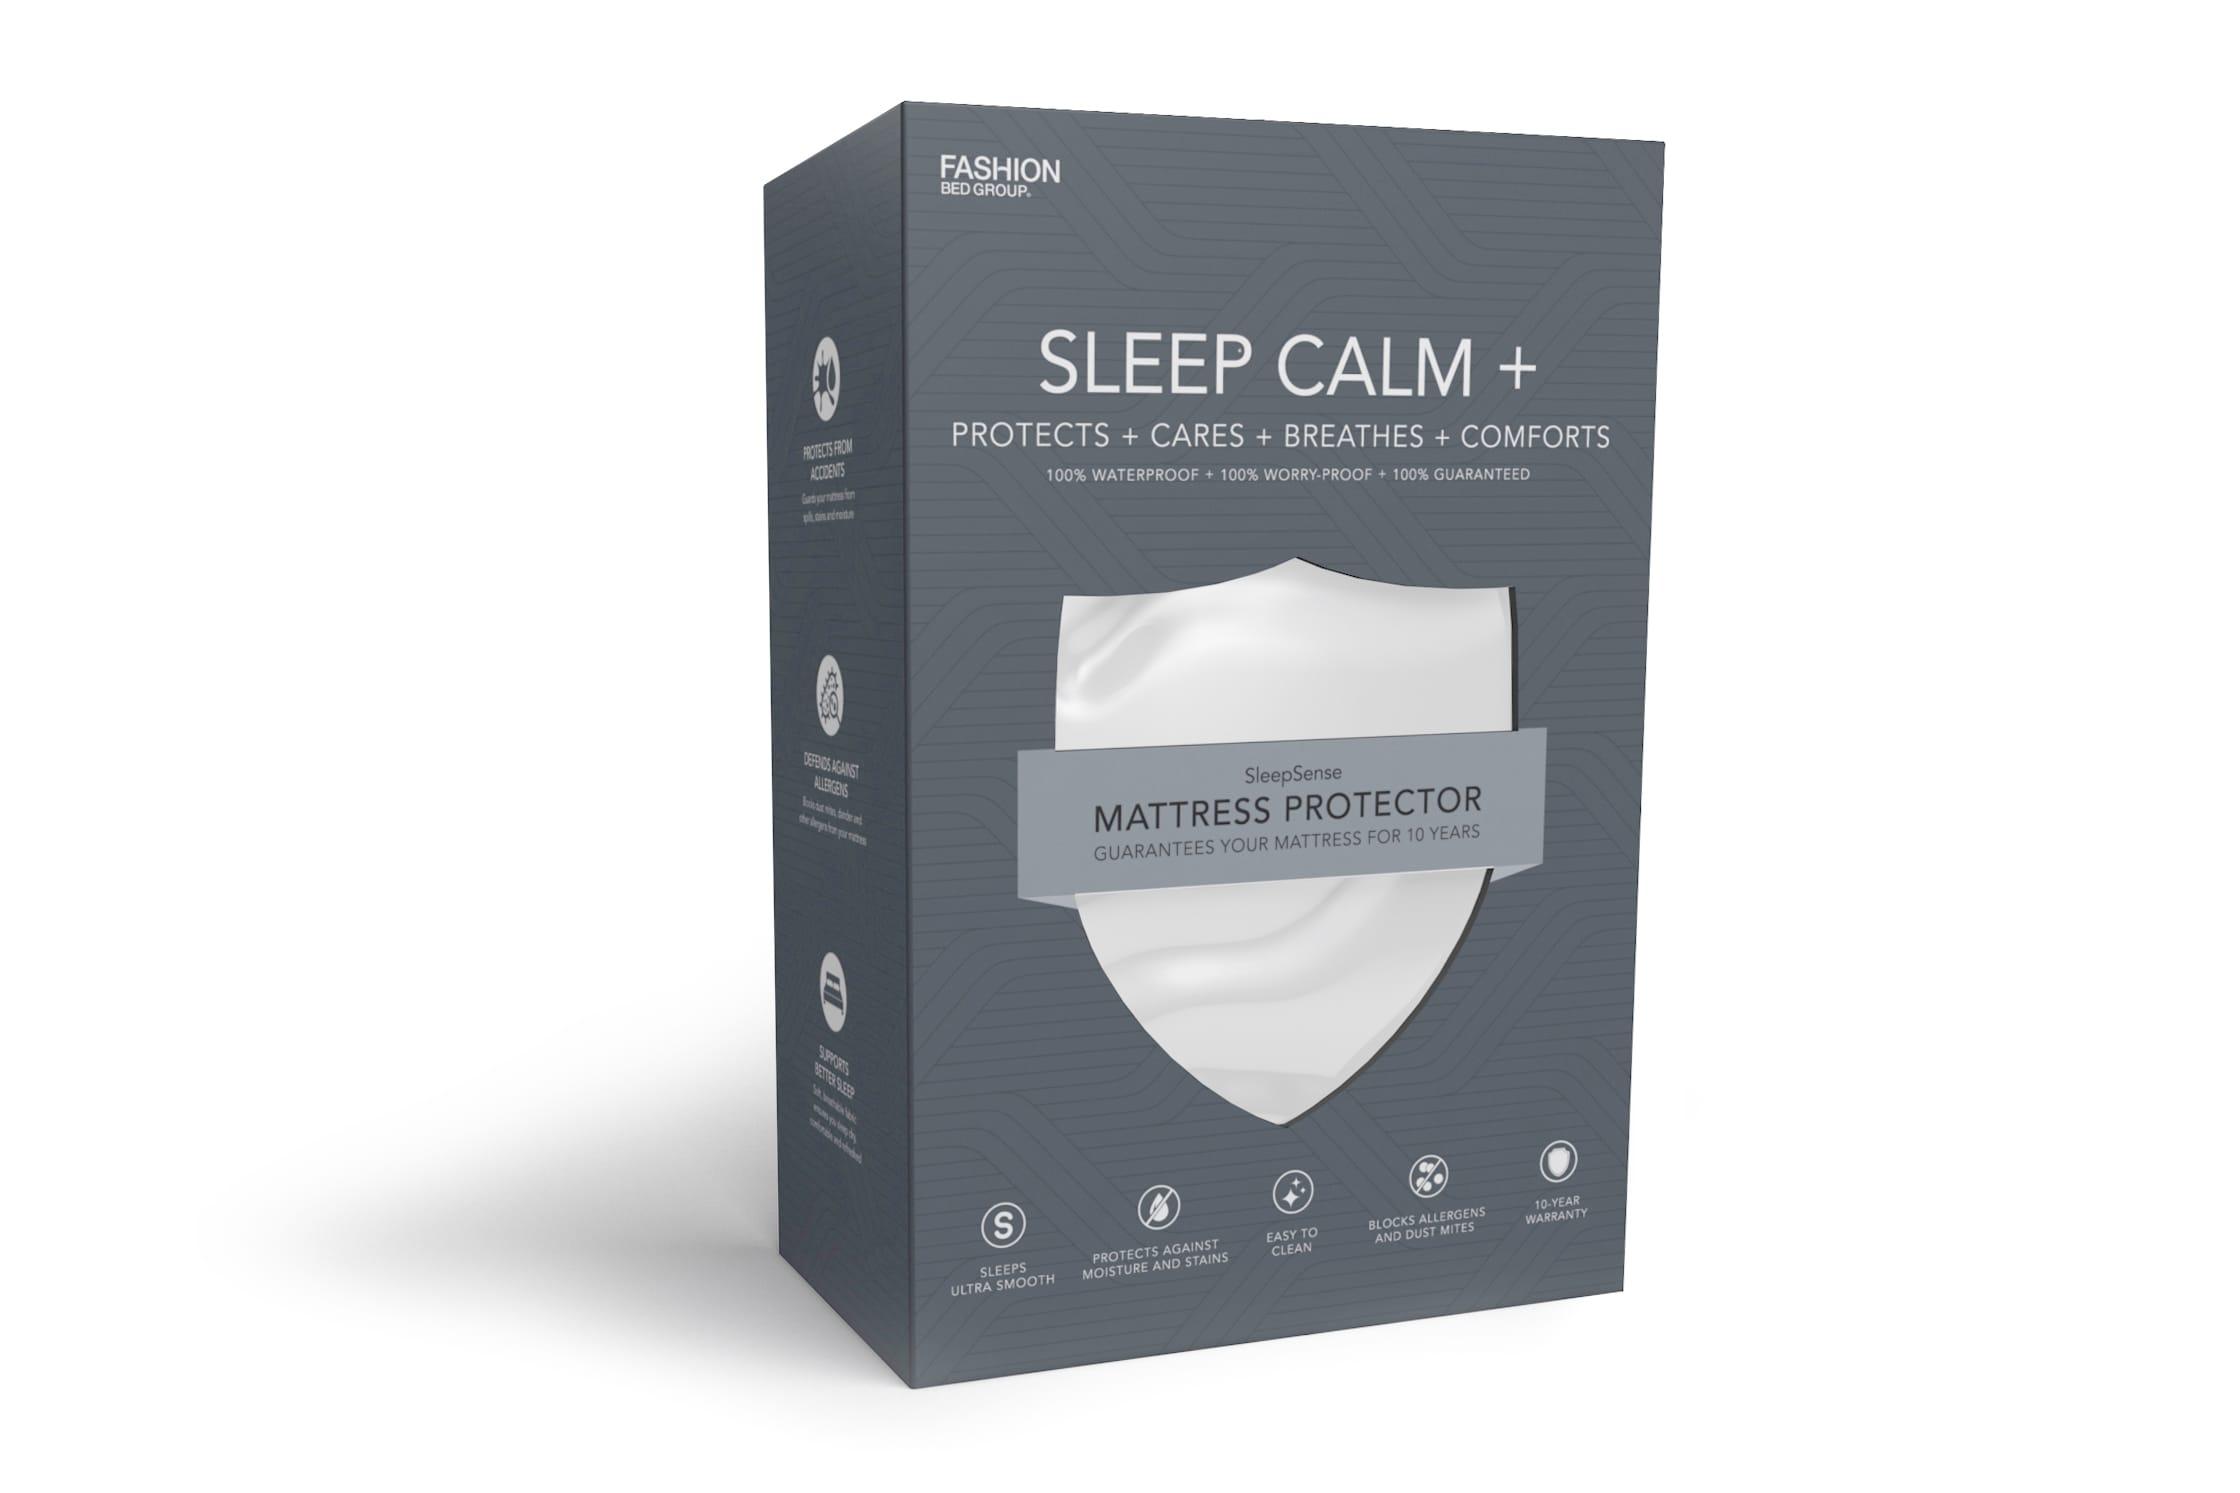 Fashion Bed Sleep Calm + Mattress Protector